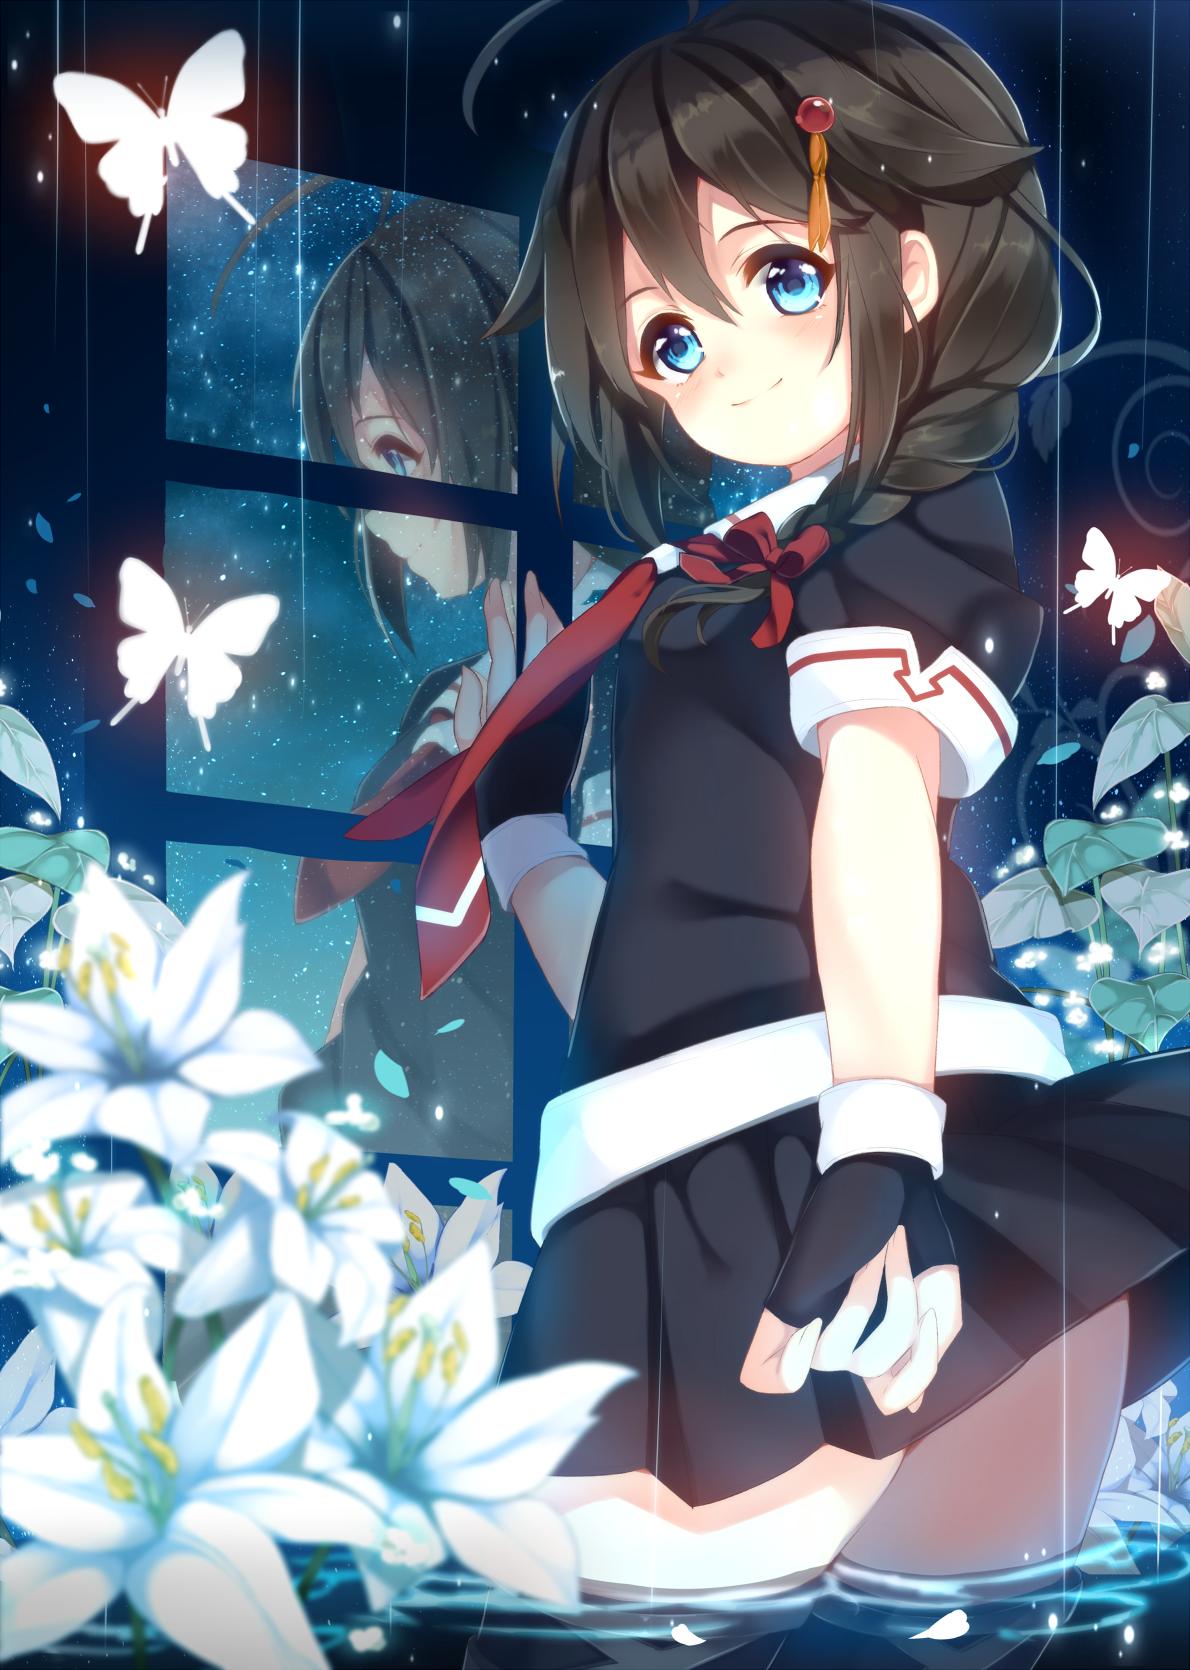 anime_wallpaper_Kantai_Collection_9927133-47231076_p0.png